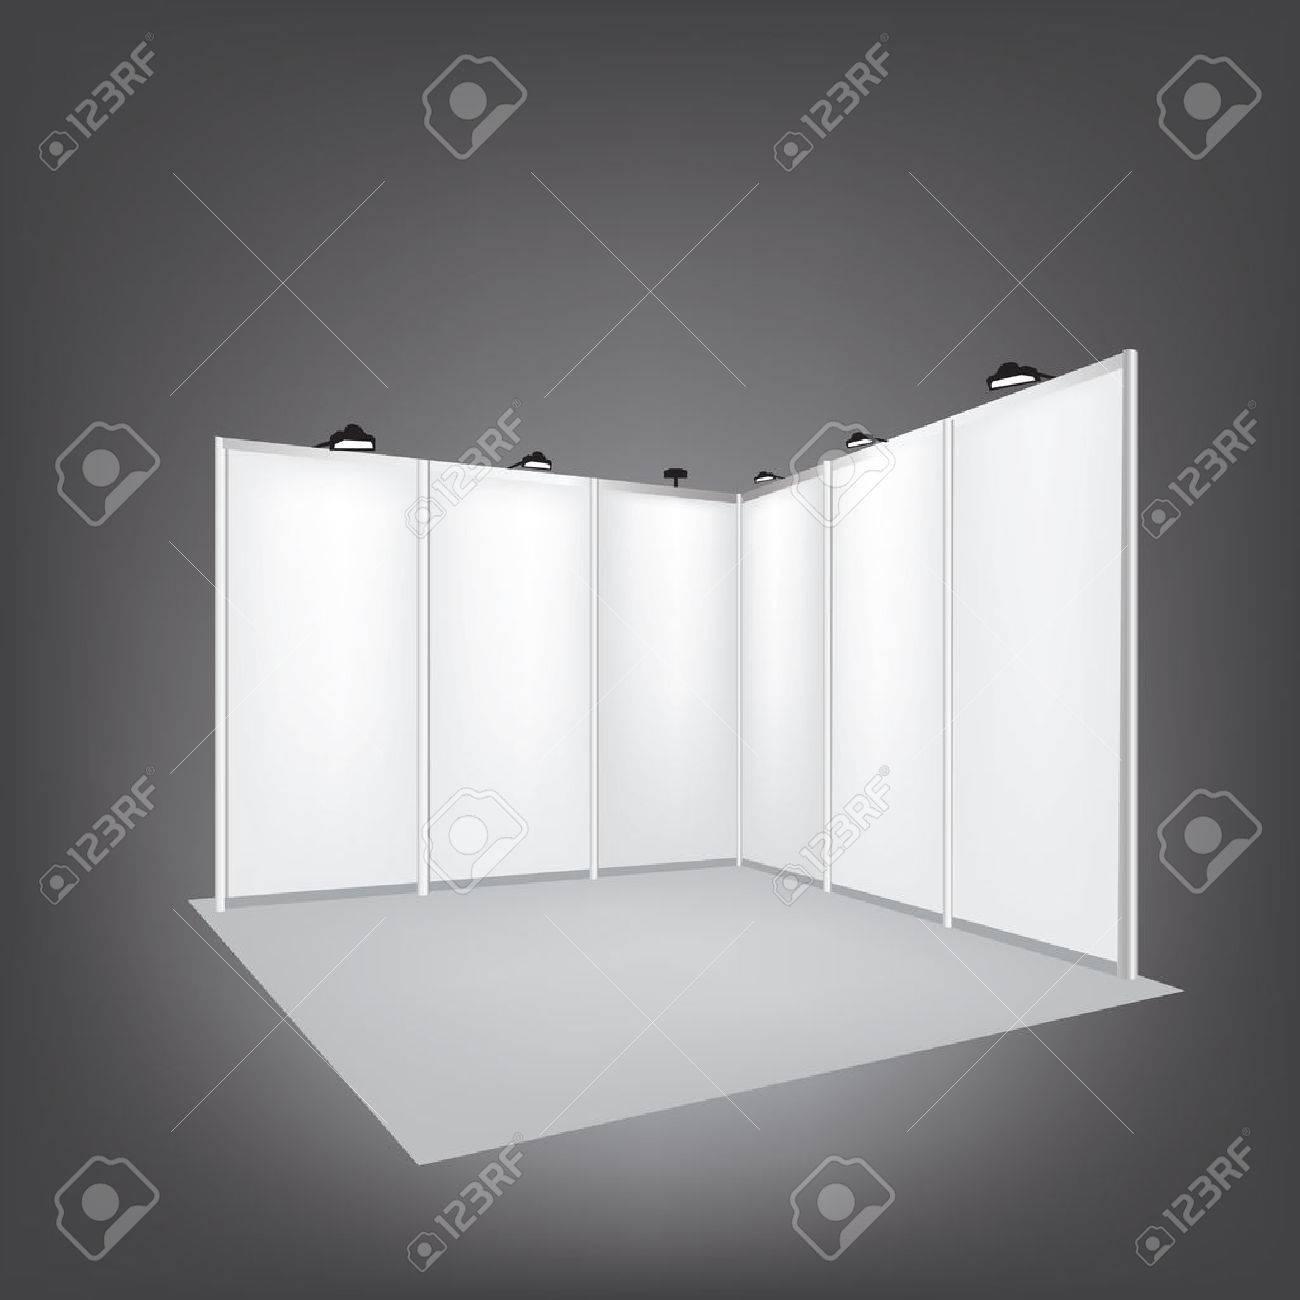 Trade Exhibition Stand Vector : Vector blank trade exhibition stand royalty free cliparts vectors